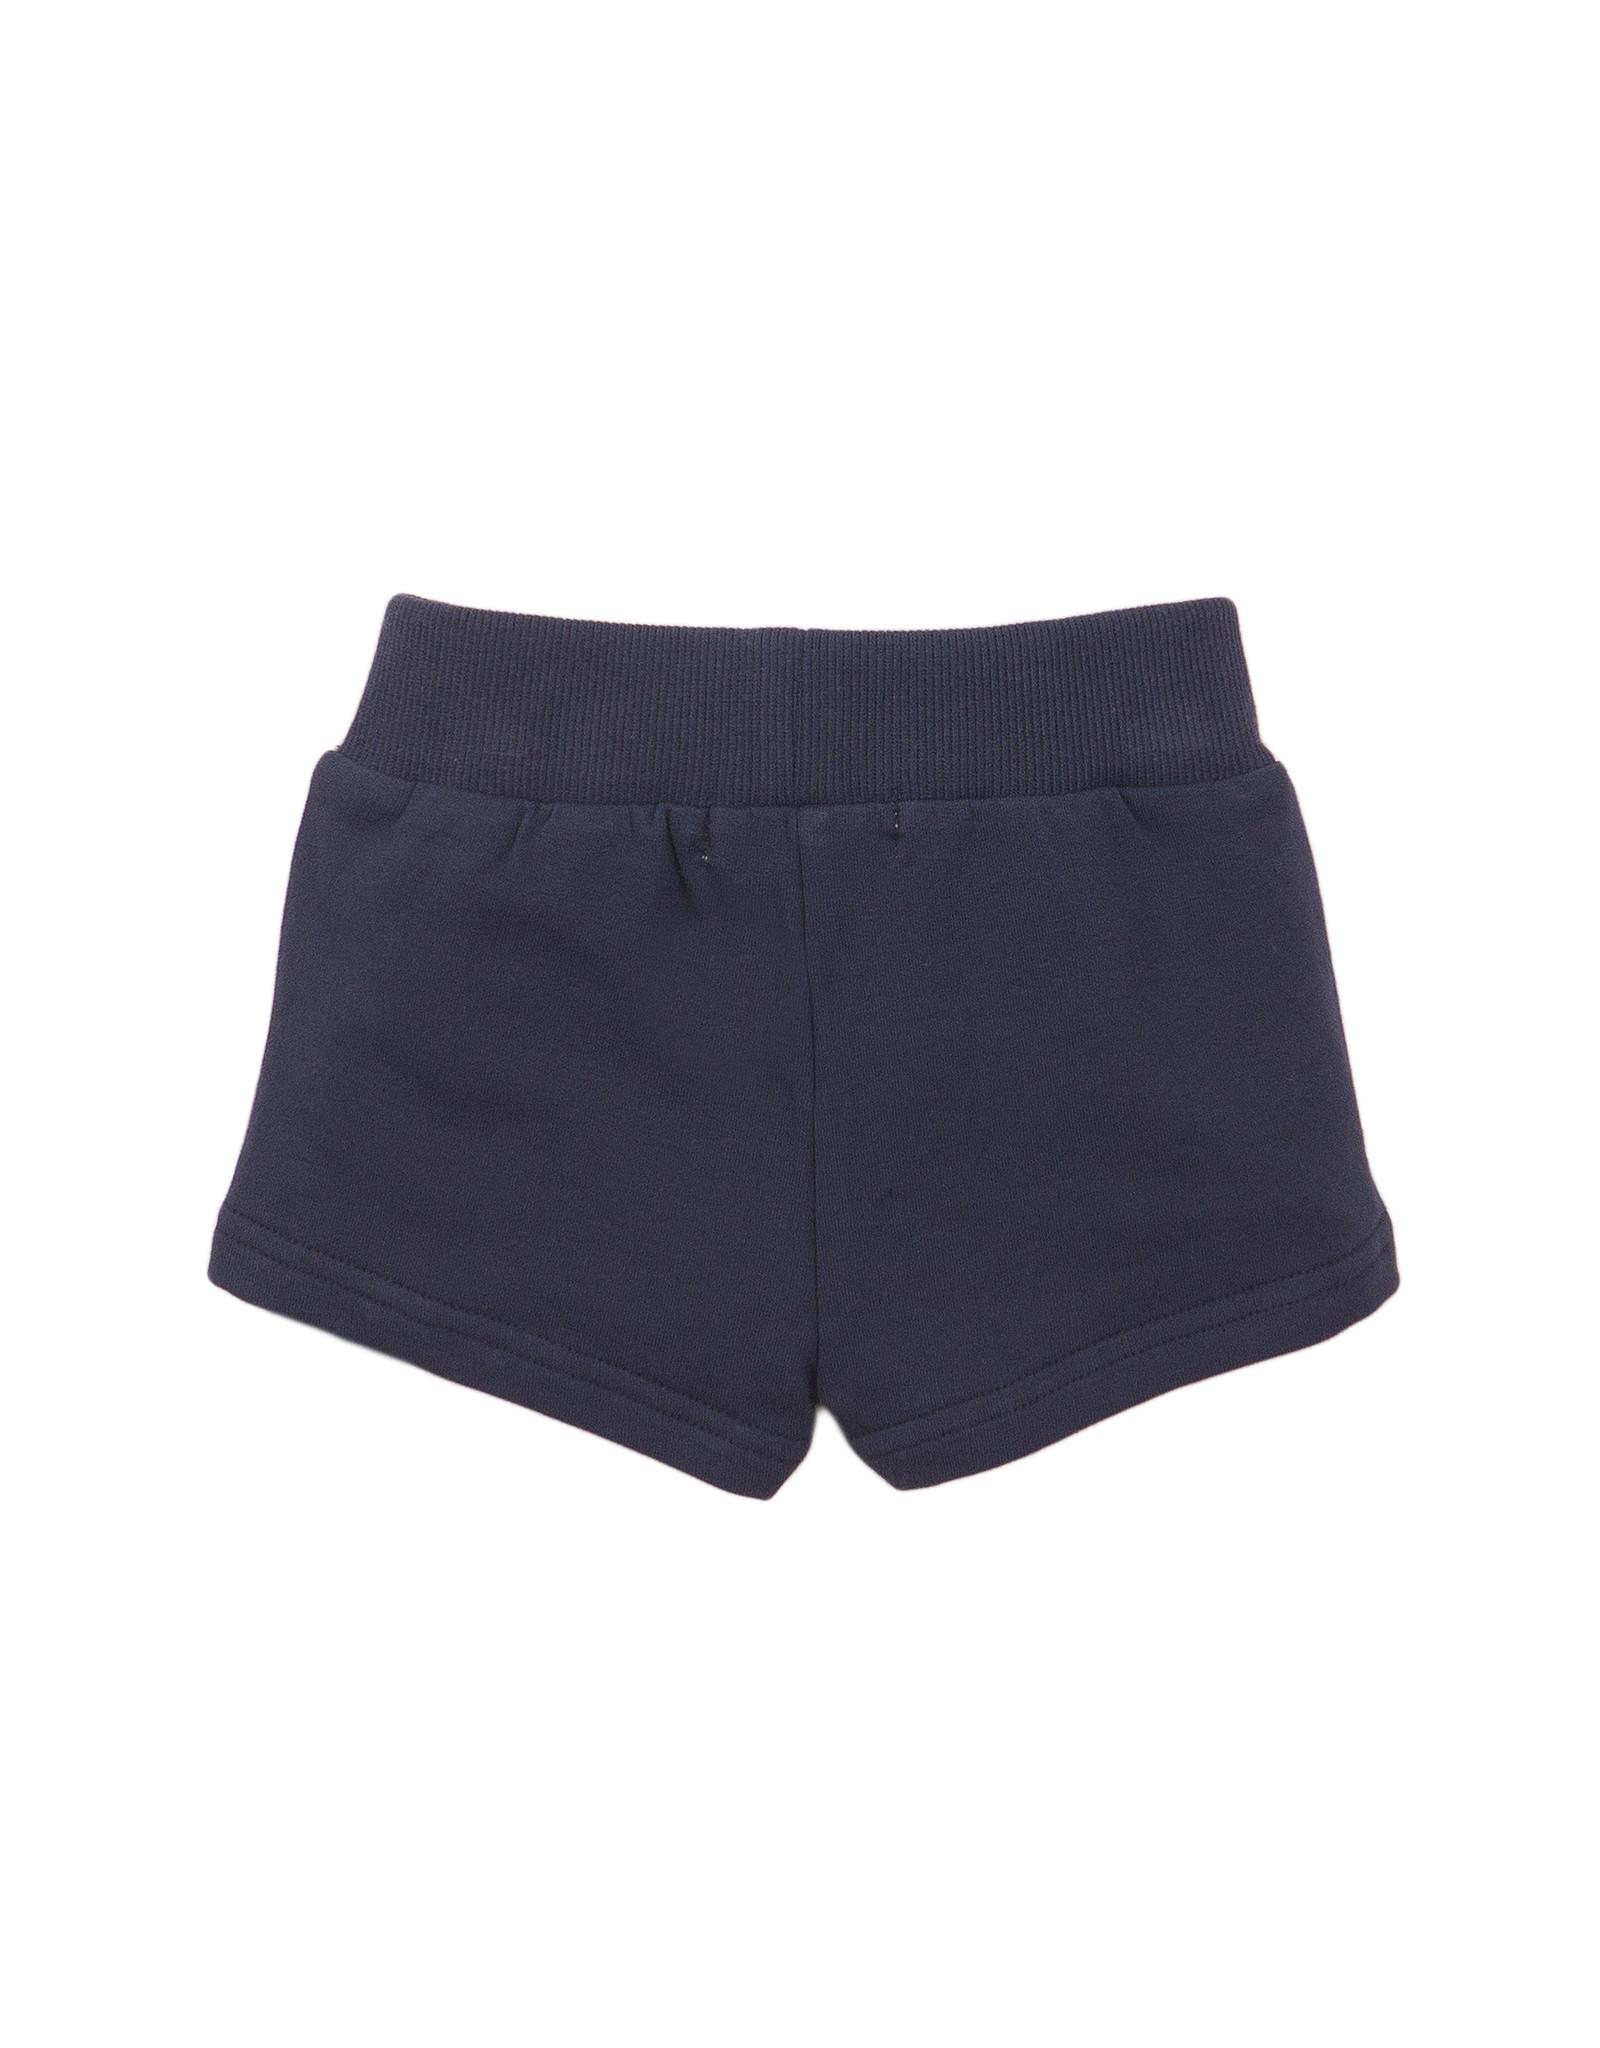 Koko Noko Jogging short, Navy, SS21